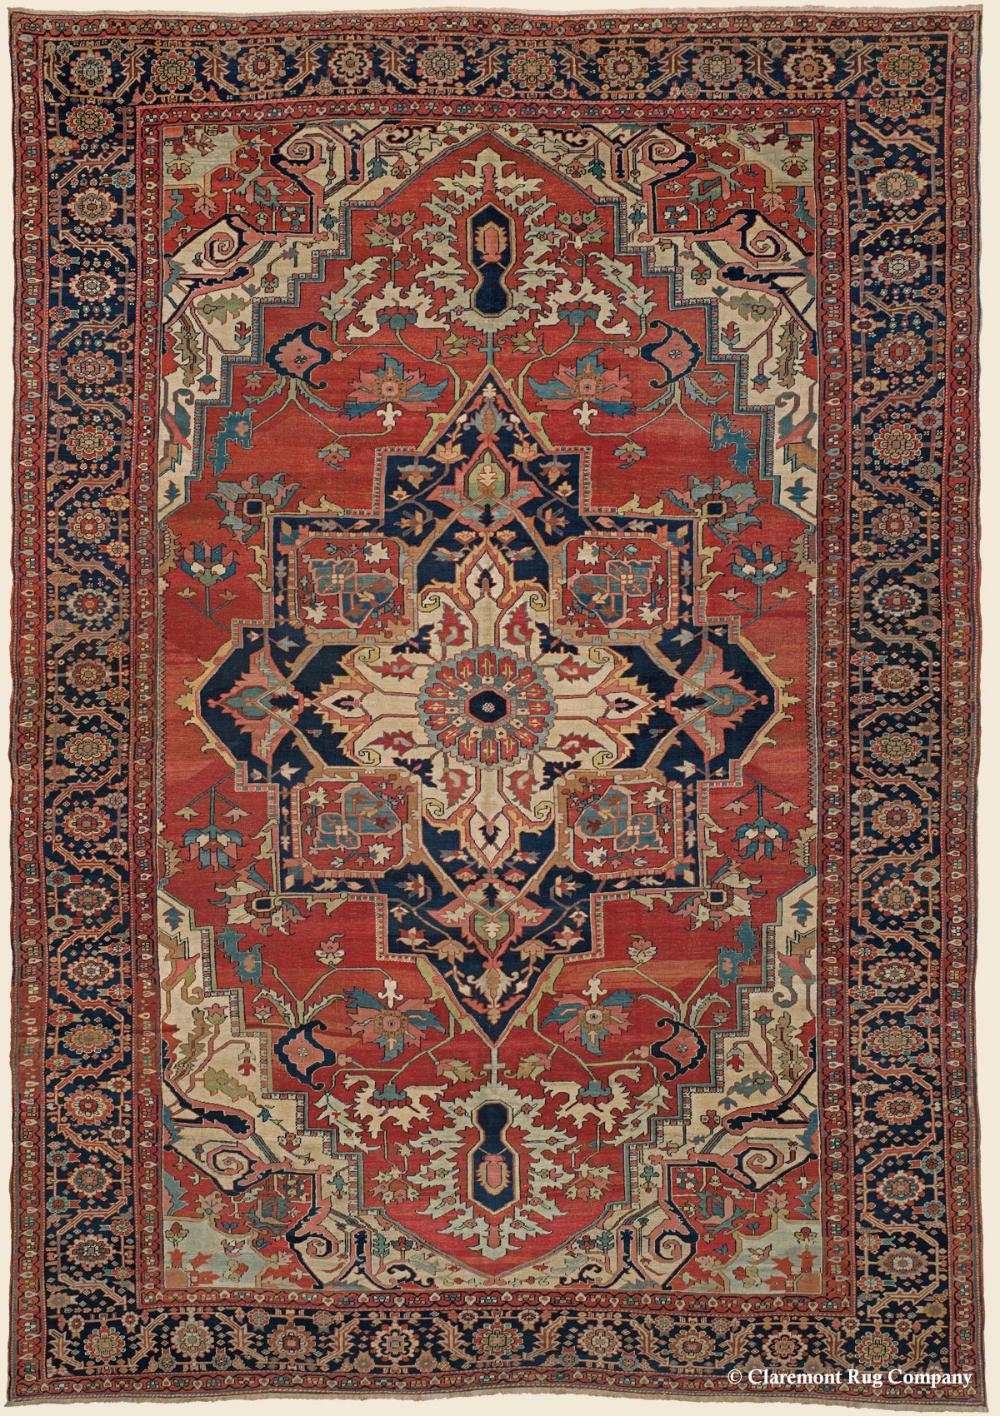 Serapi Northwest Persian Oversize Collectible Carpet Antique Rug 11 0 X 15 10 Circa 1875 In 2020 Persian Rug Designs Claremont Rug Company Antique Persian Carpet